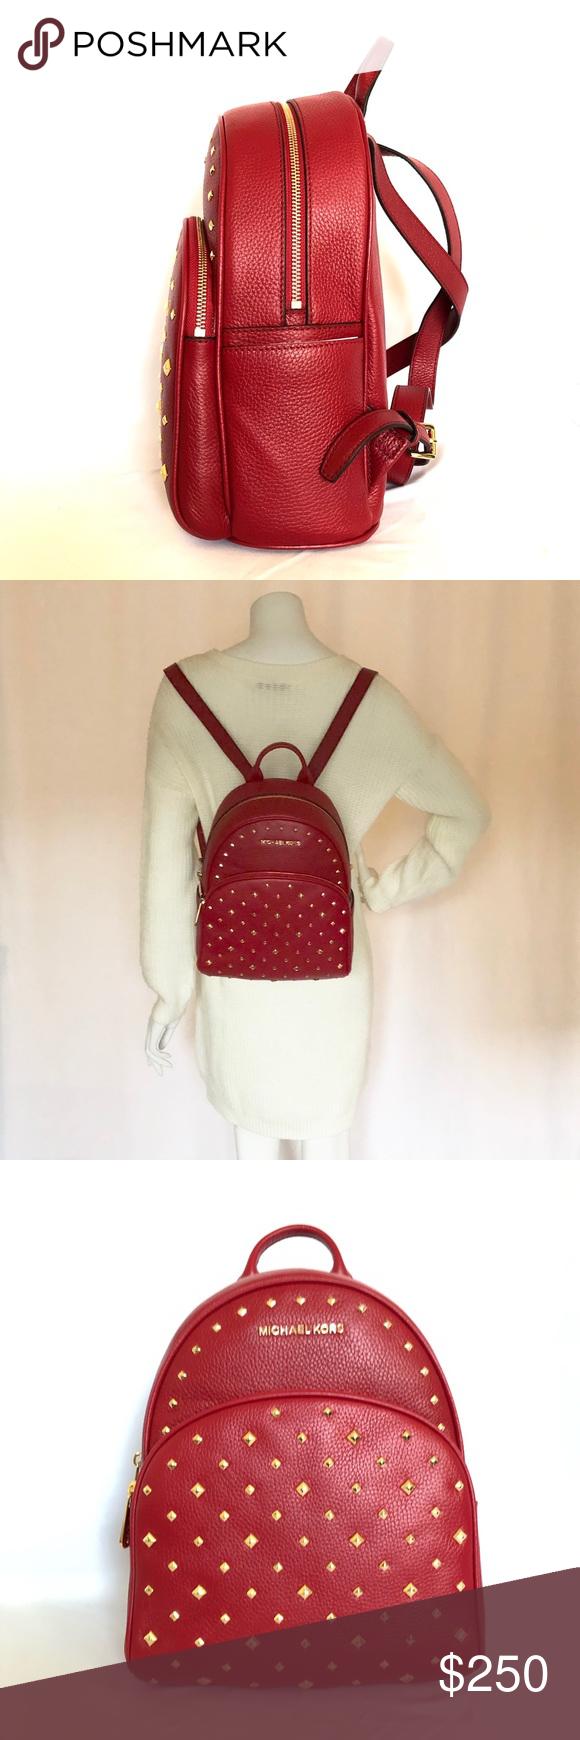 Michael Kors Abbey Studded Medium Backpack ❌PRICE FIRM❌ NO OFFERS MICHAEL  KORS Abbey Medium d6da1b674a790